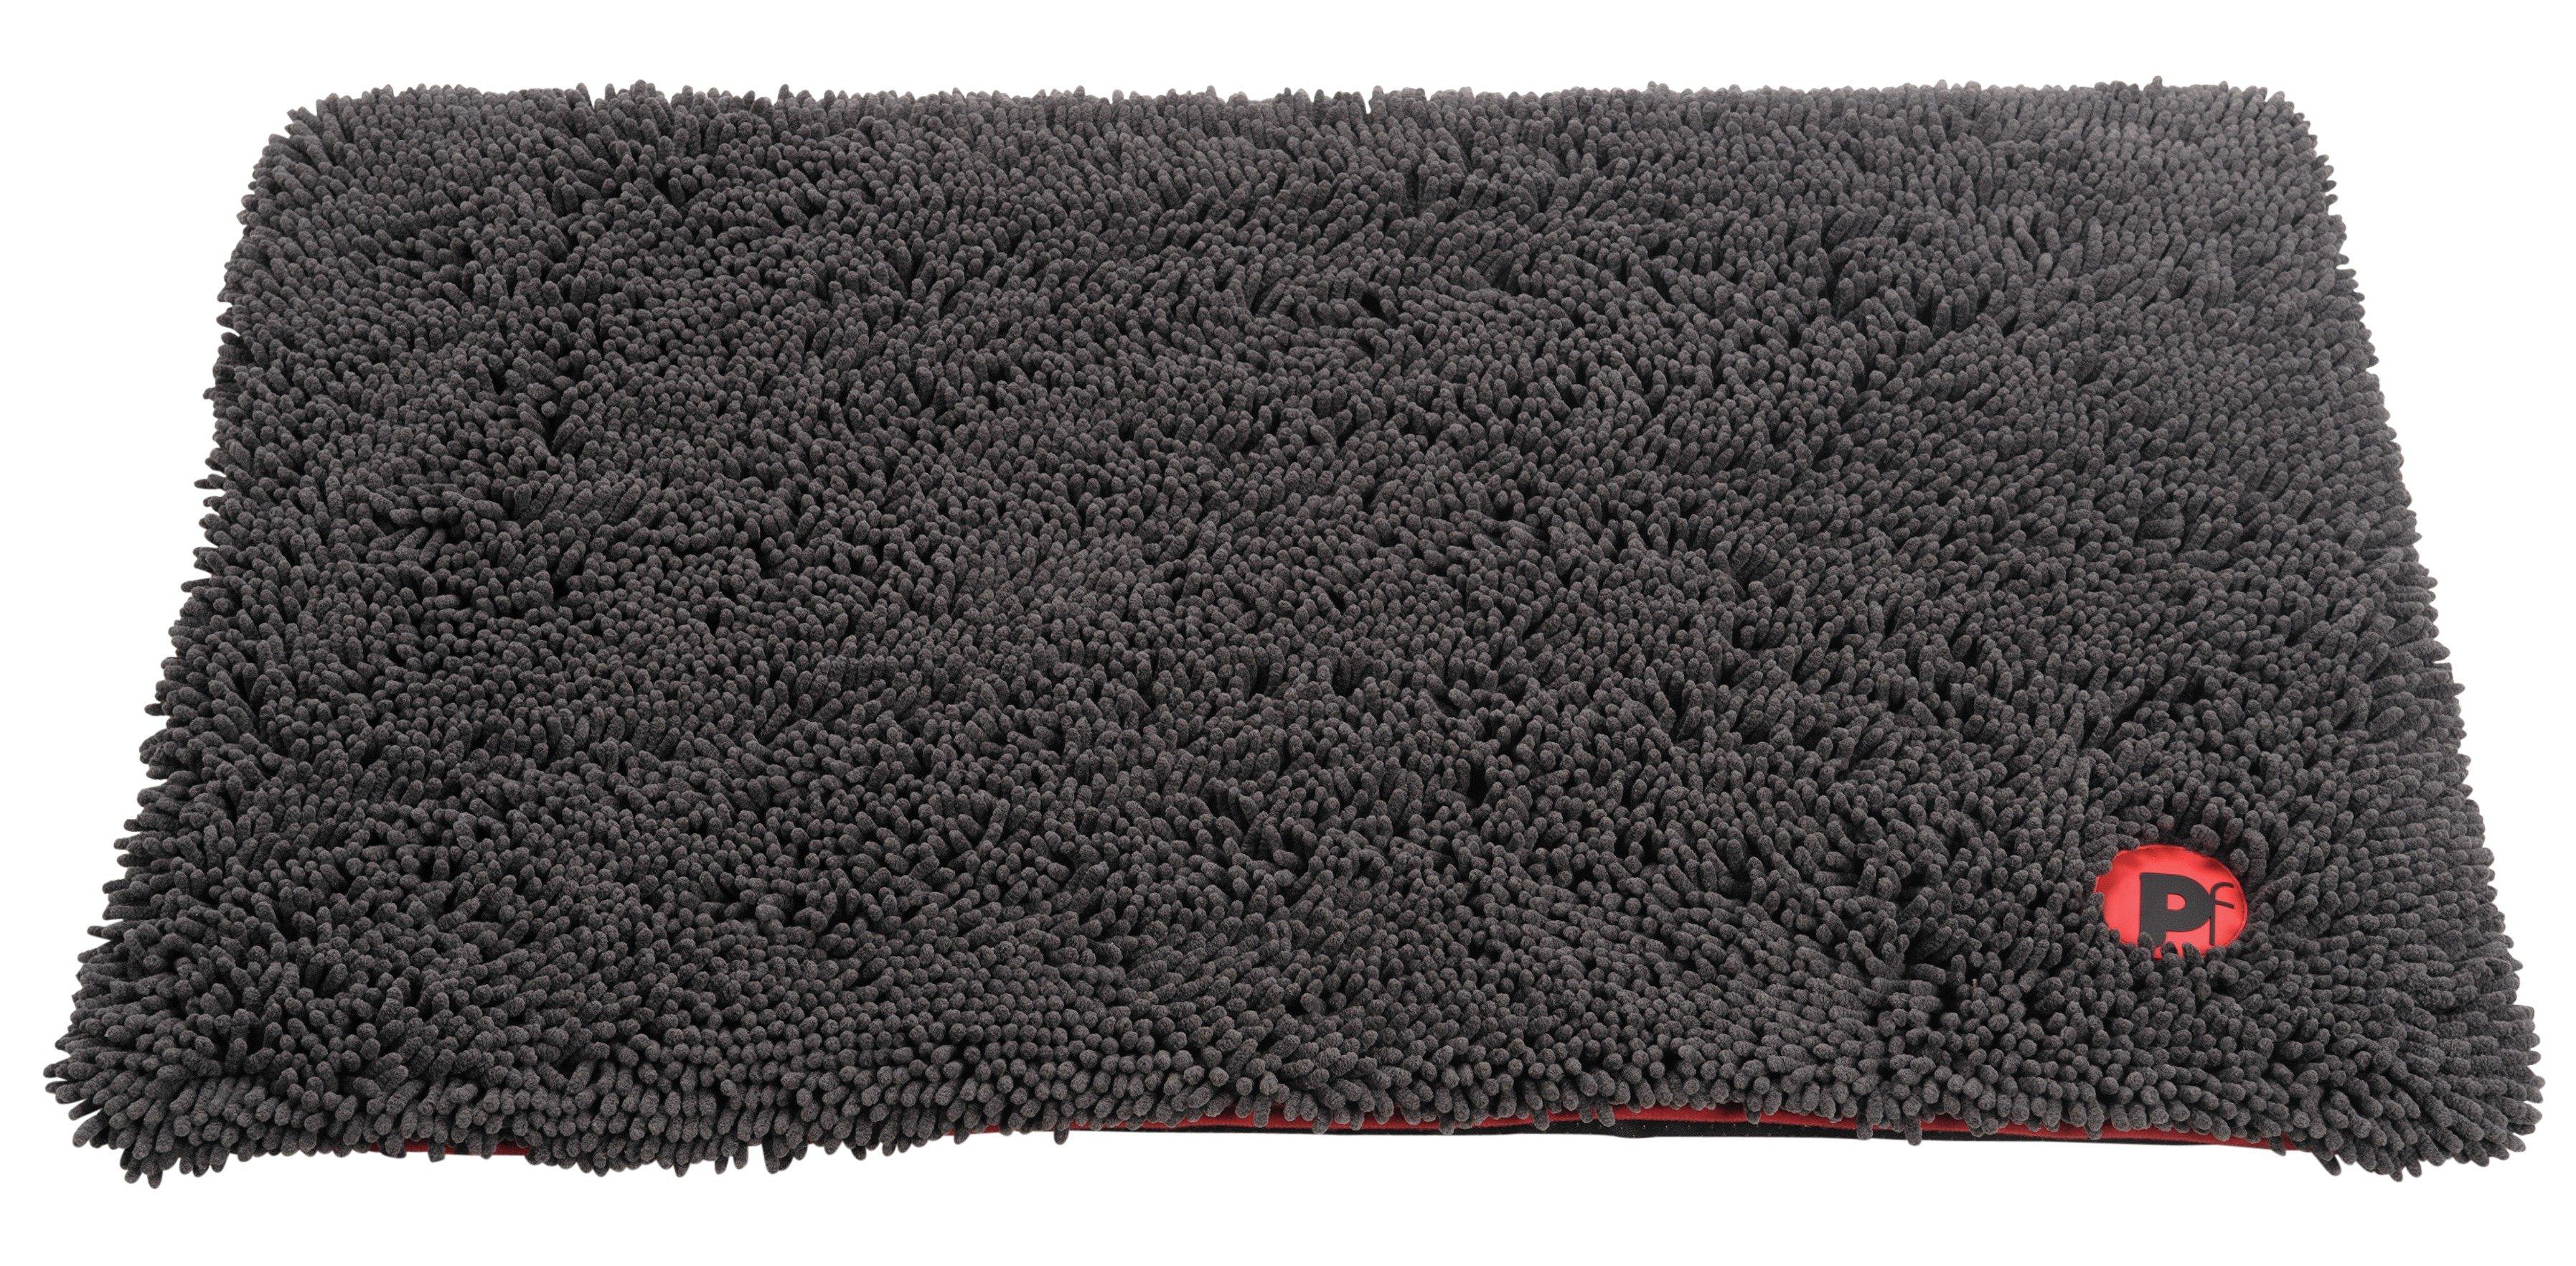 petface-memory-foam-microfiber-dog-crate-mat-large